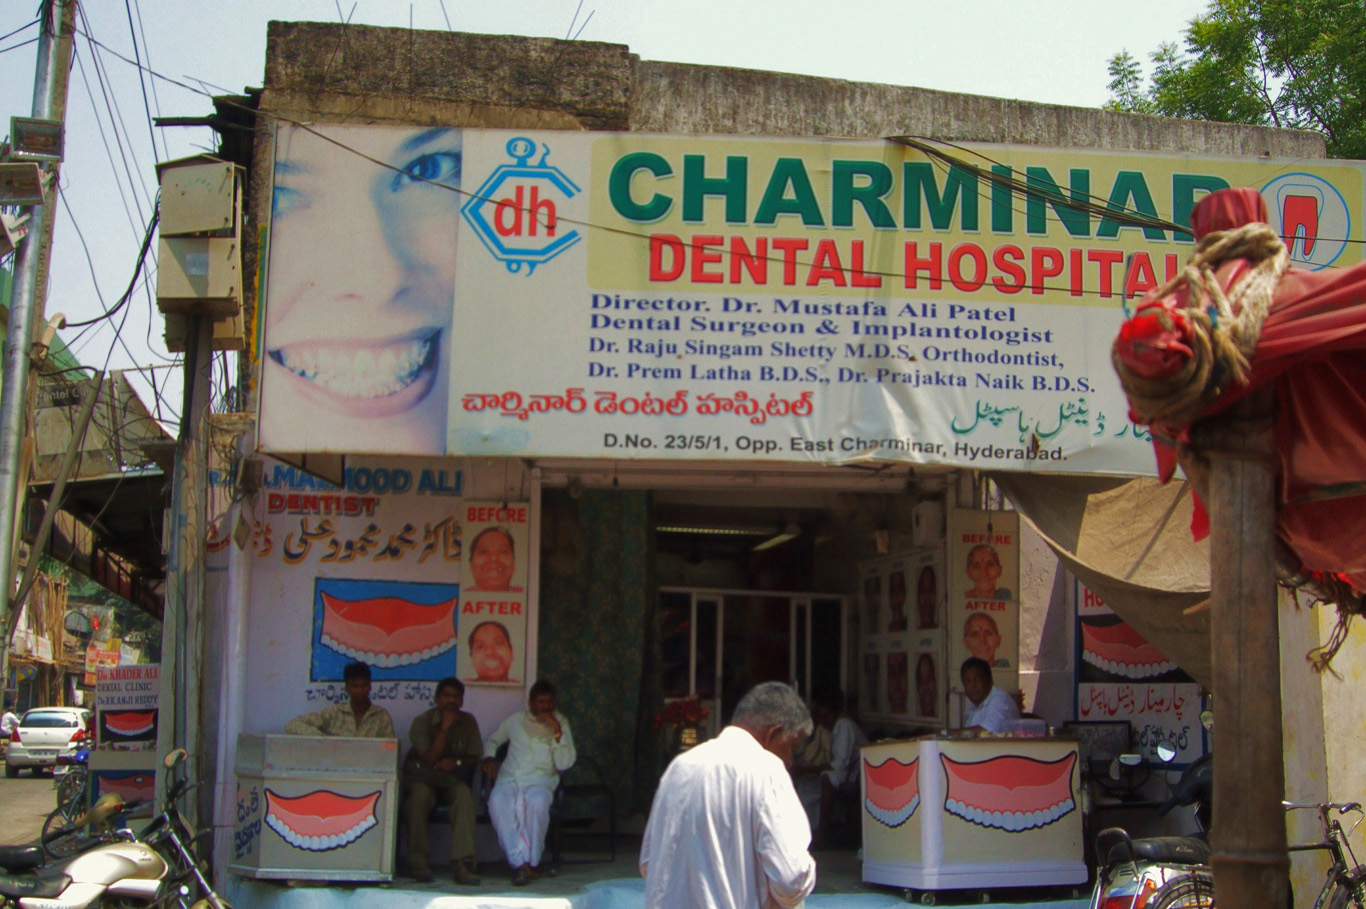 A dental clinic in Hyderabad